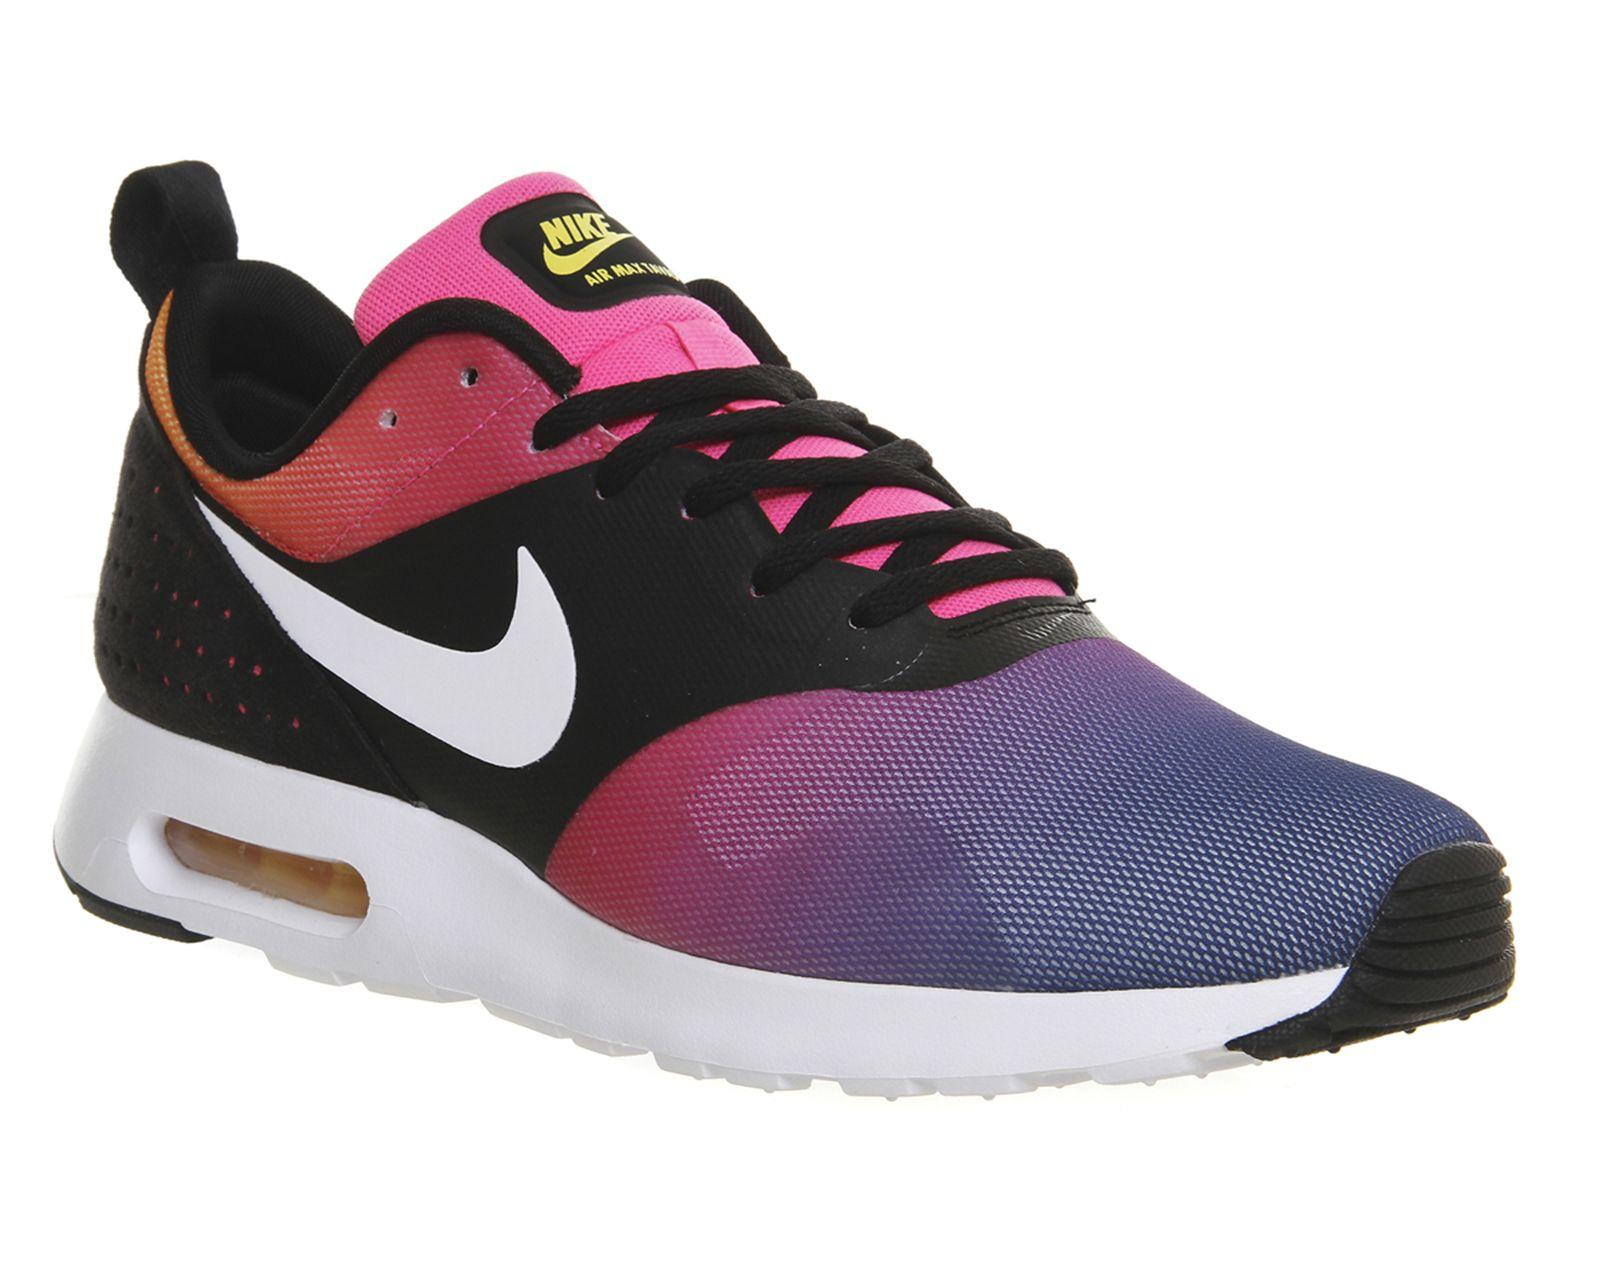 1e635f0f70 Nike Air Max Tavas Black White Pink Pow Yellow Sd | Shoes!!!! | Nike ...